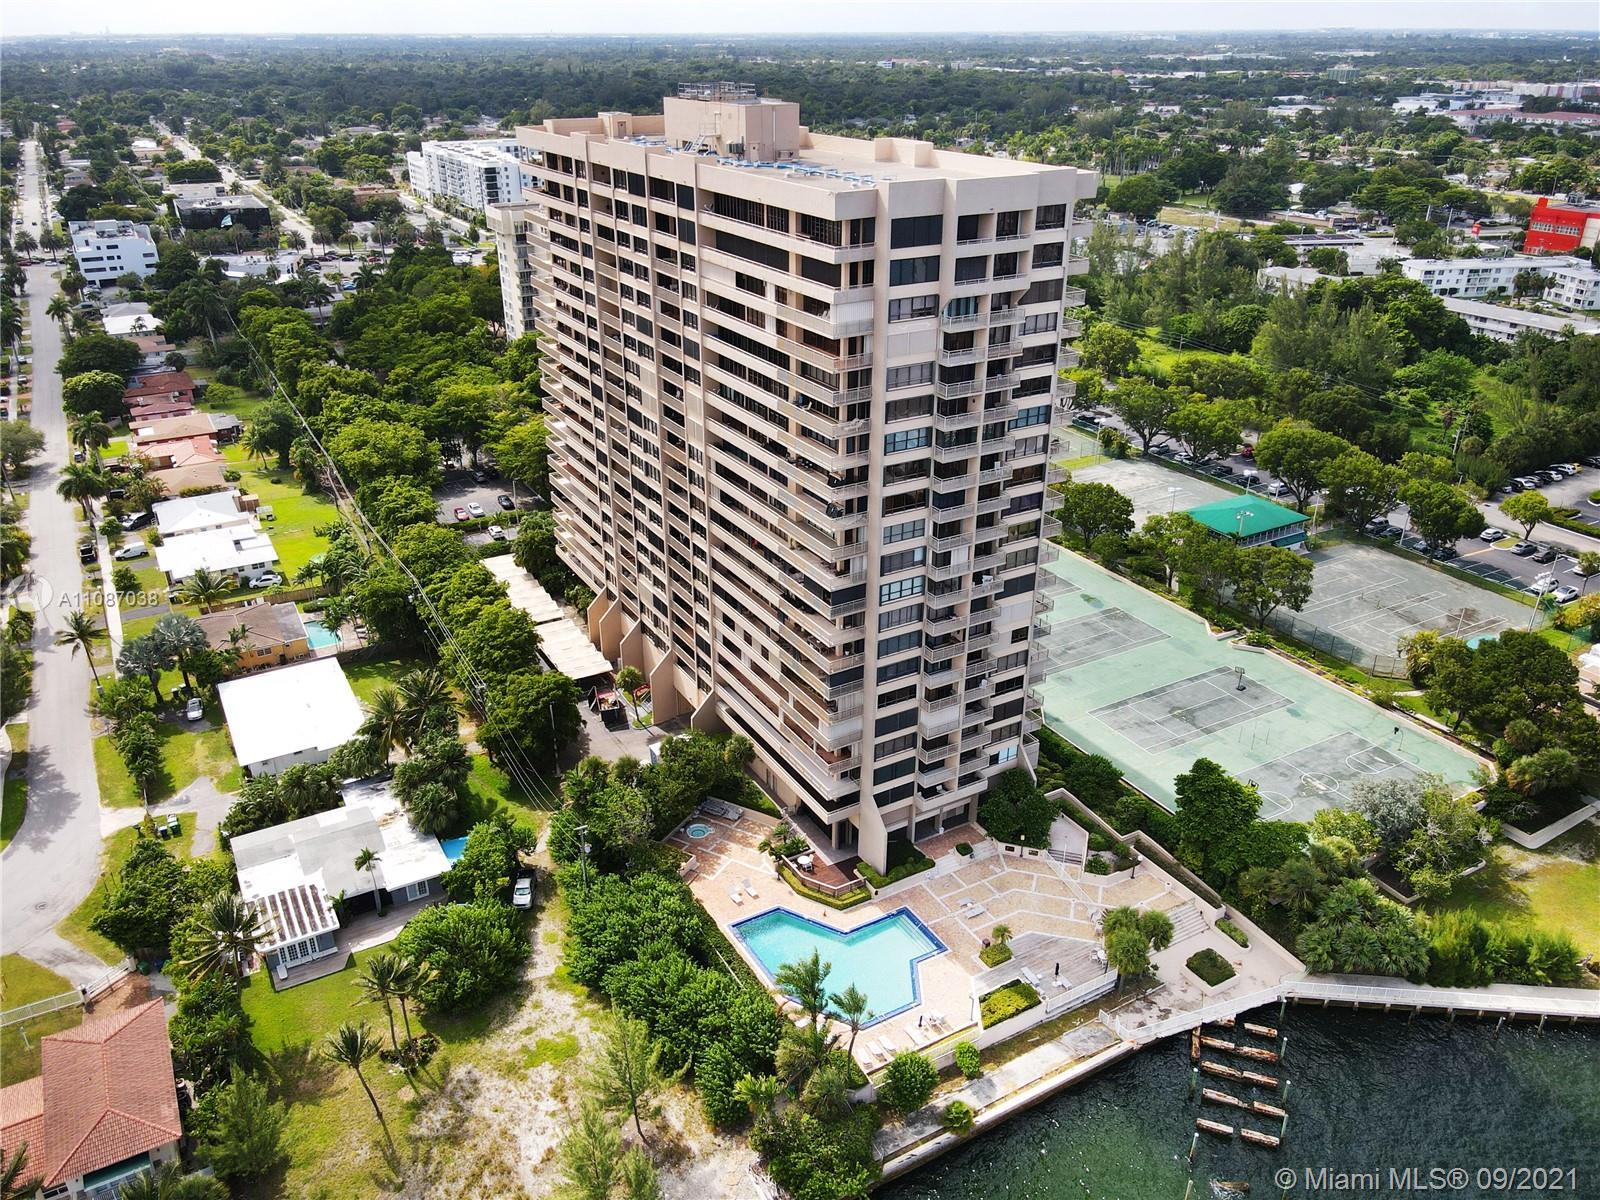 Jockey Club Building III #1756 - 11113 Biscayne Blvd #1756, North Miami, FL 33181